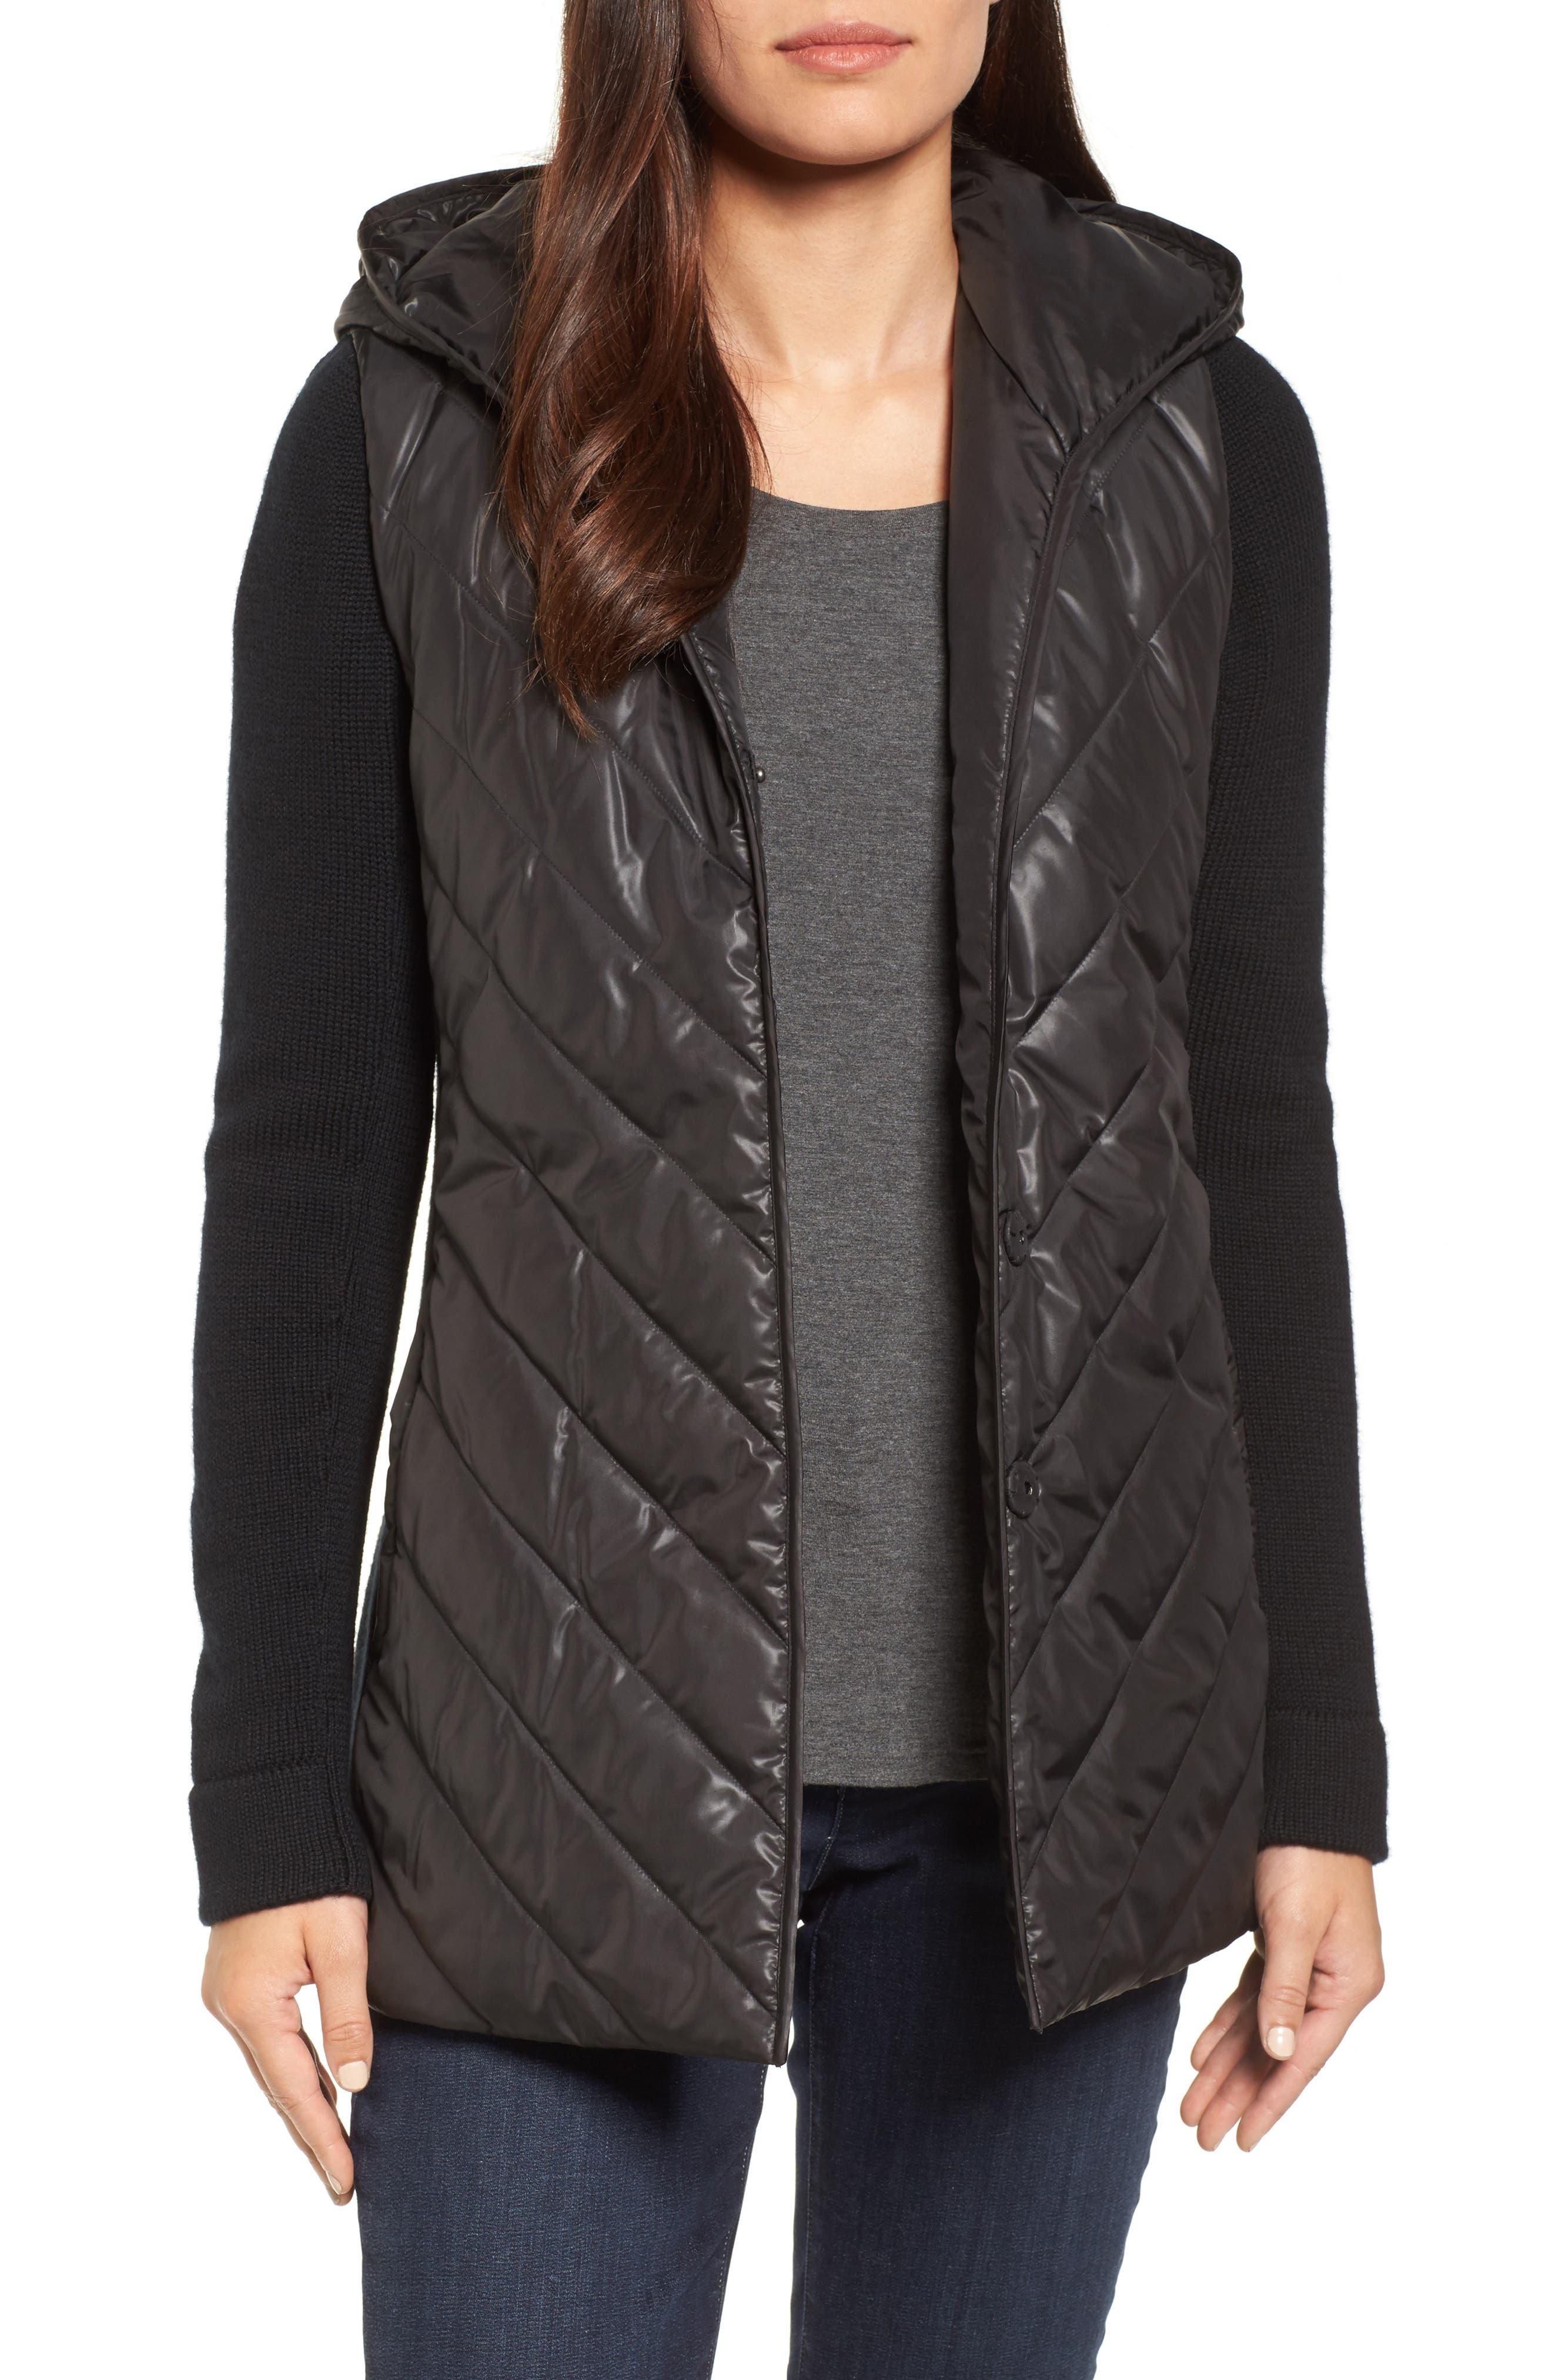 Main Image - Eileen Fisher Hooded Merino Wool Trim Jacket